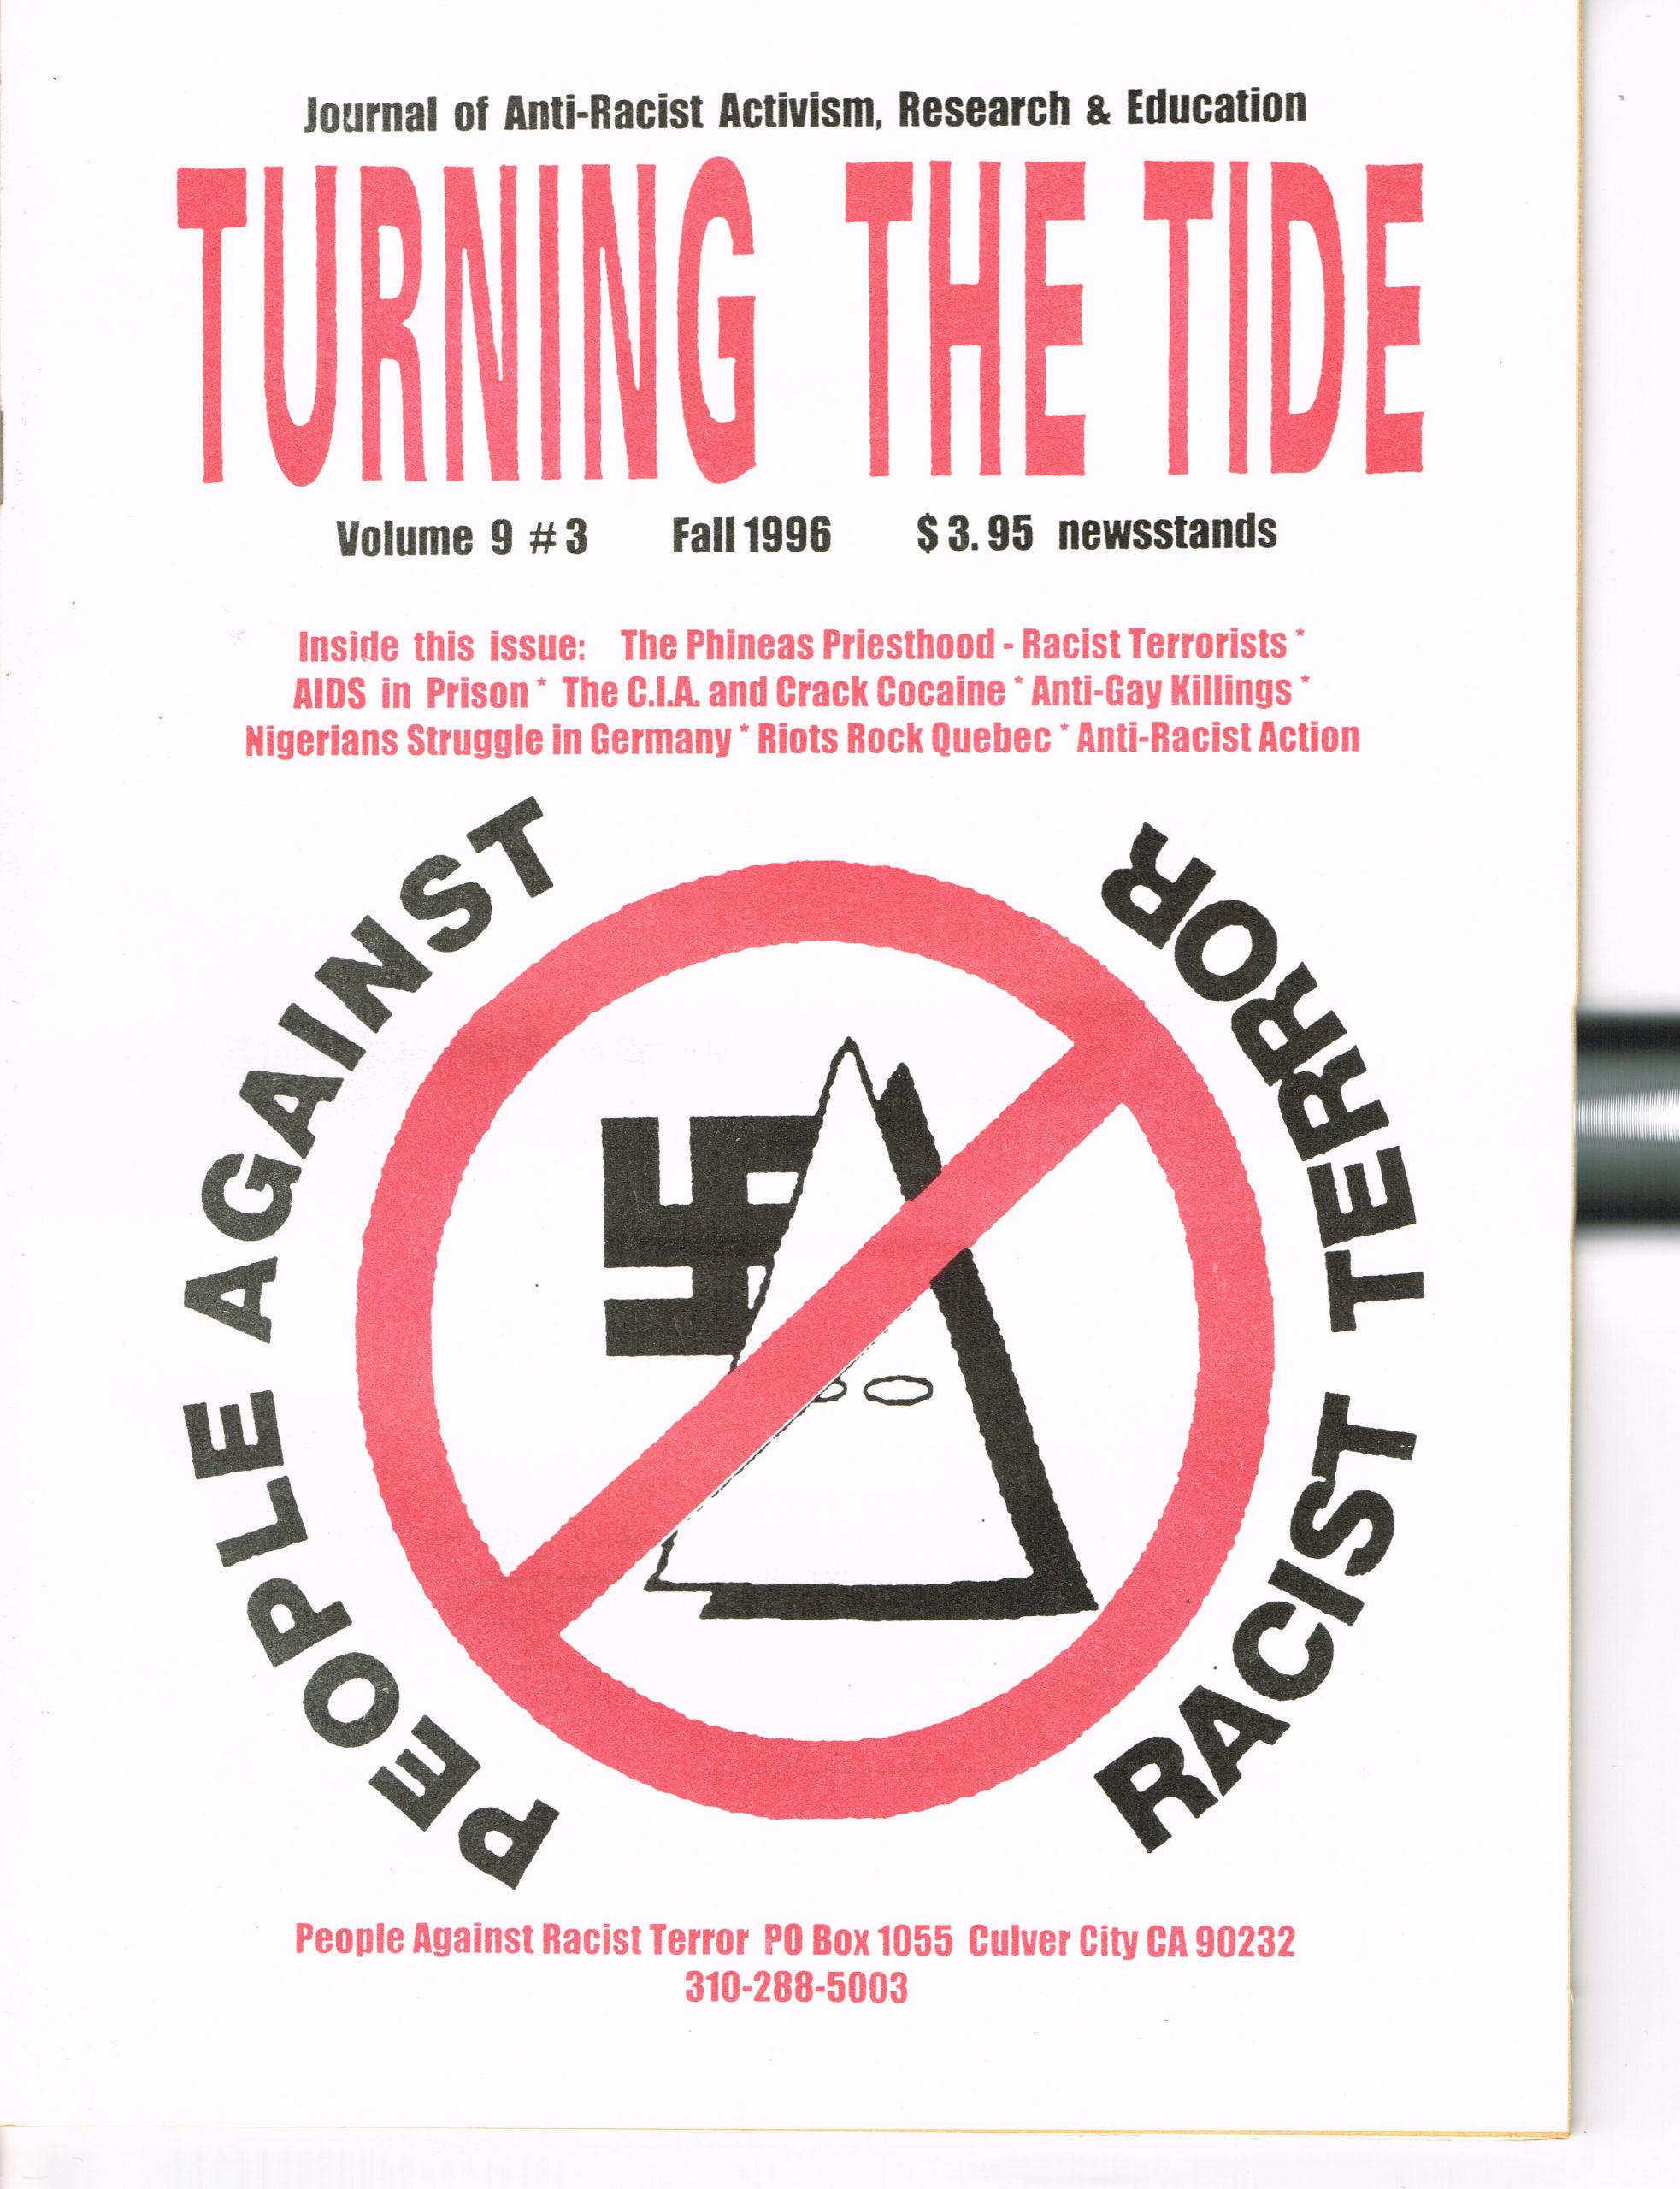 Vol. 9, #3 – Fall 1996